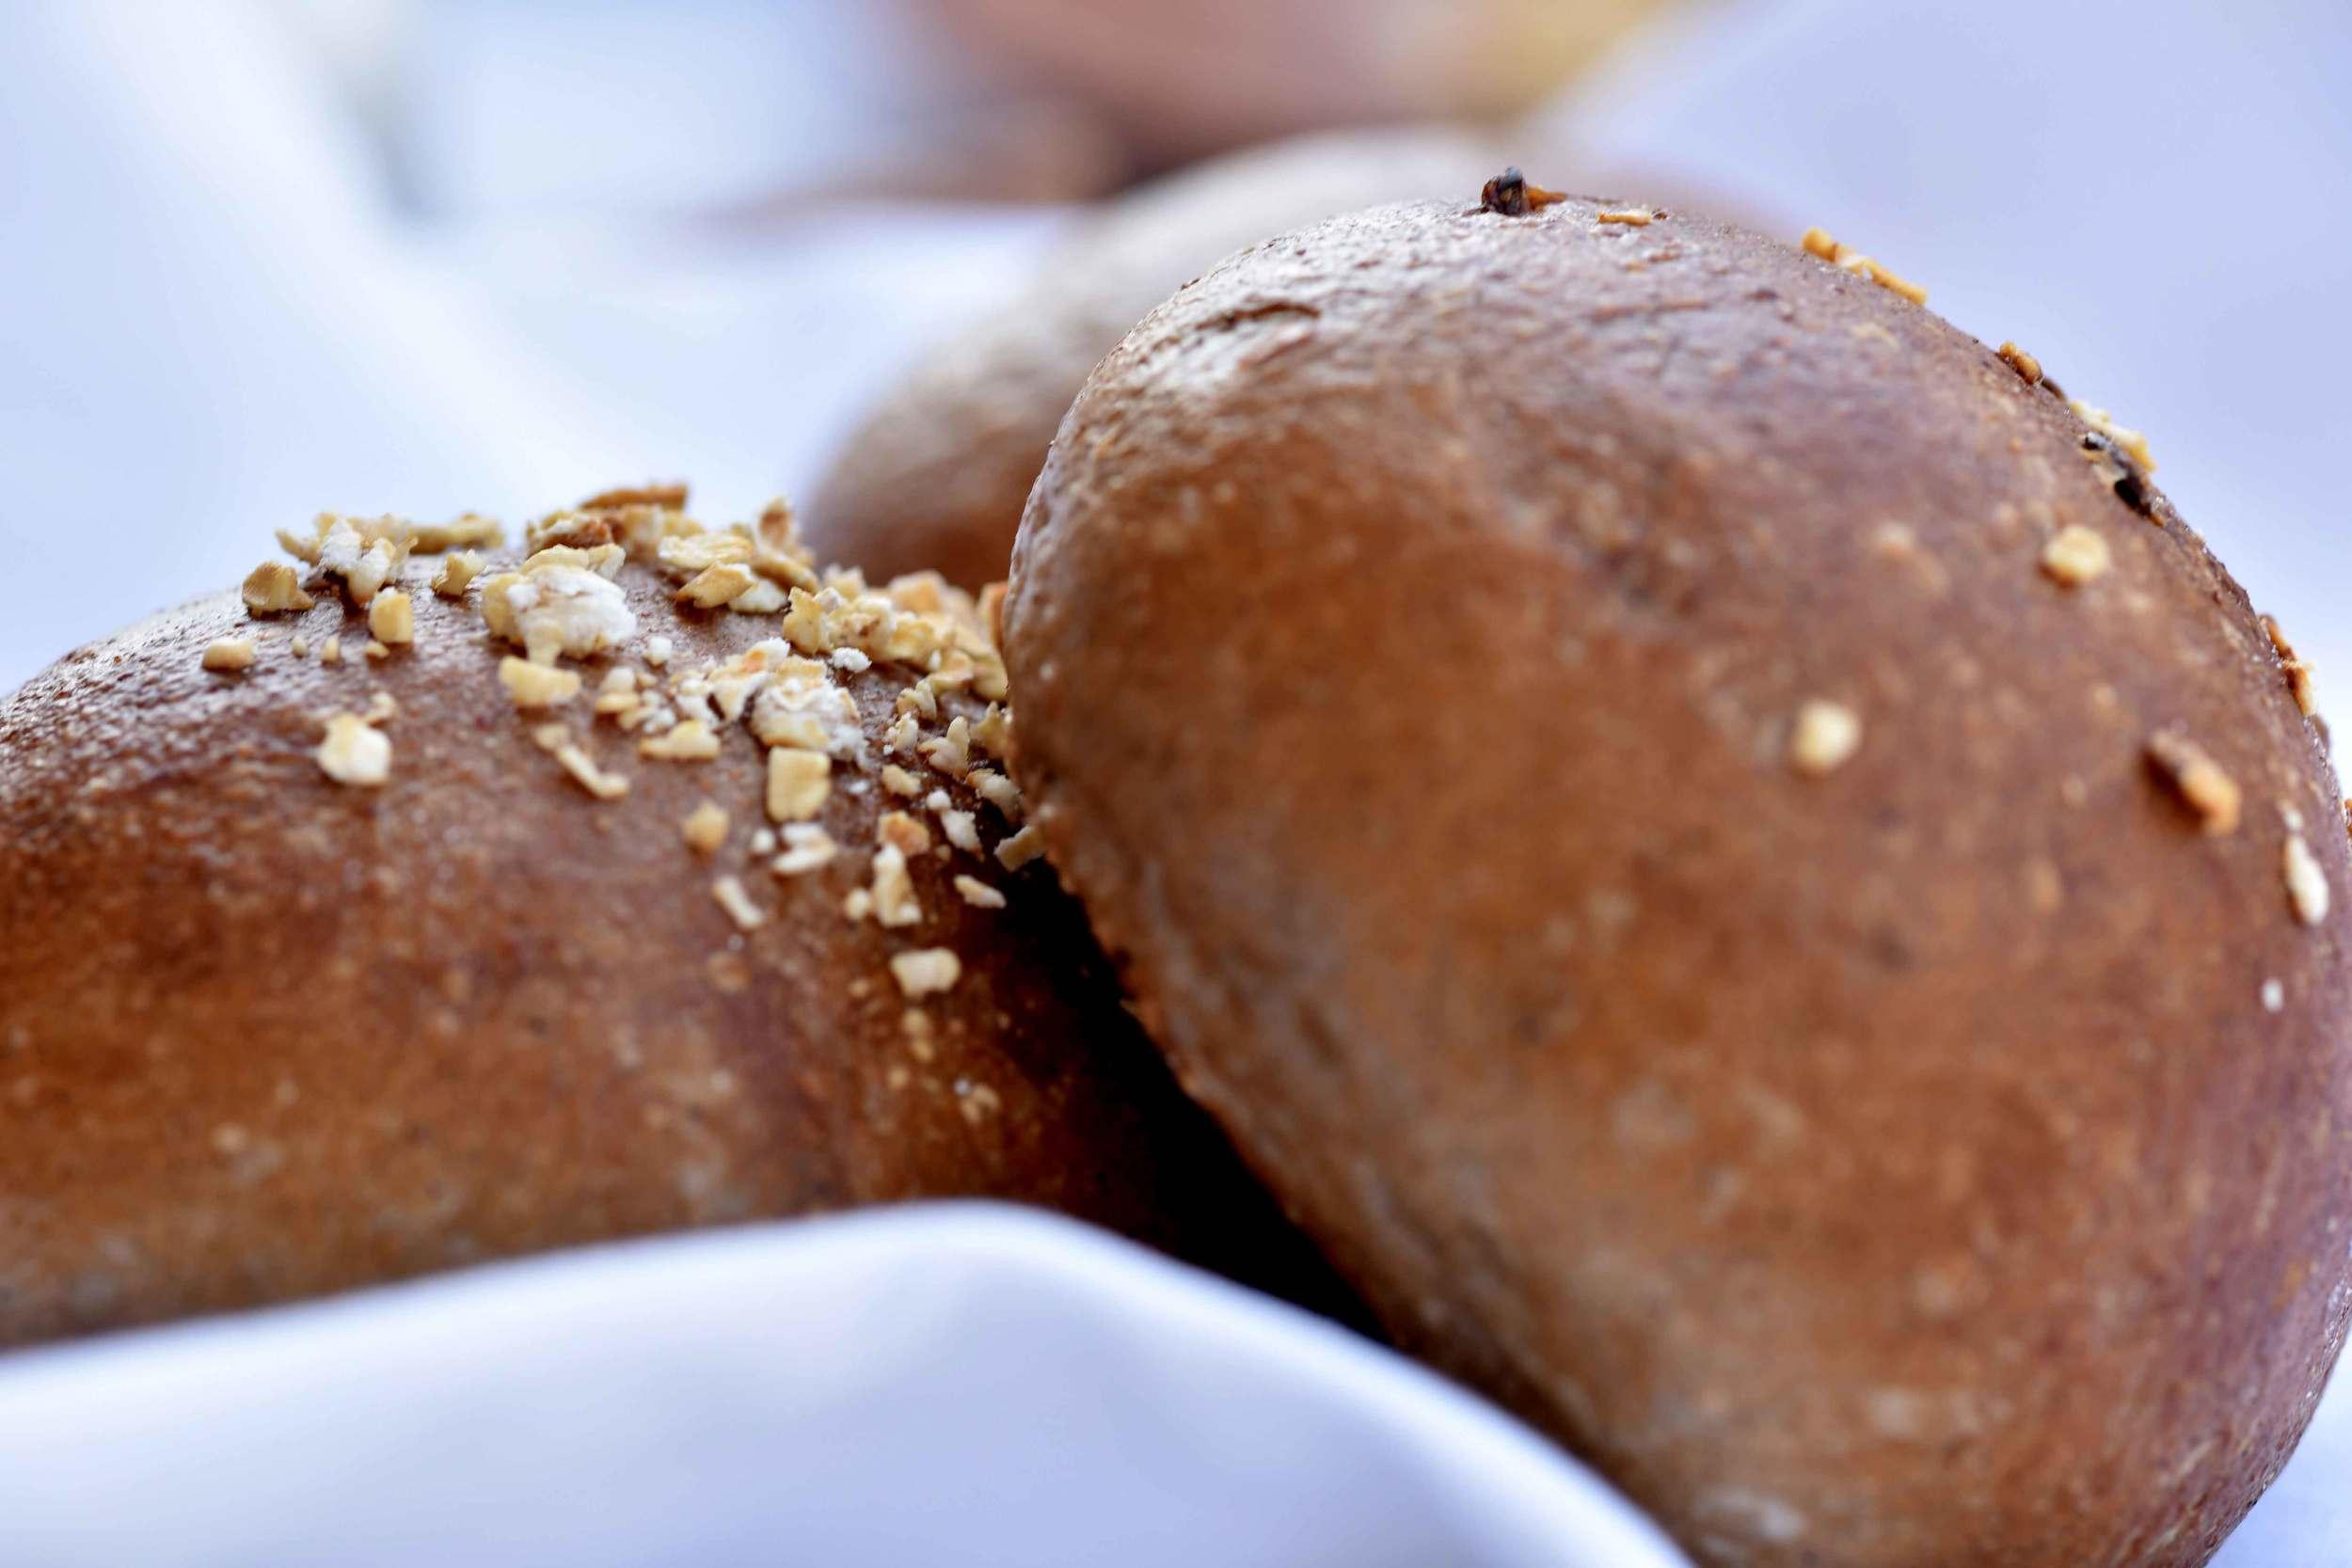 Italian bread, Dining at the beach restaurant, Park Hyatt Hotel, Goa, image©sourcingstyle.com.